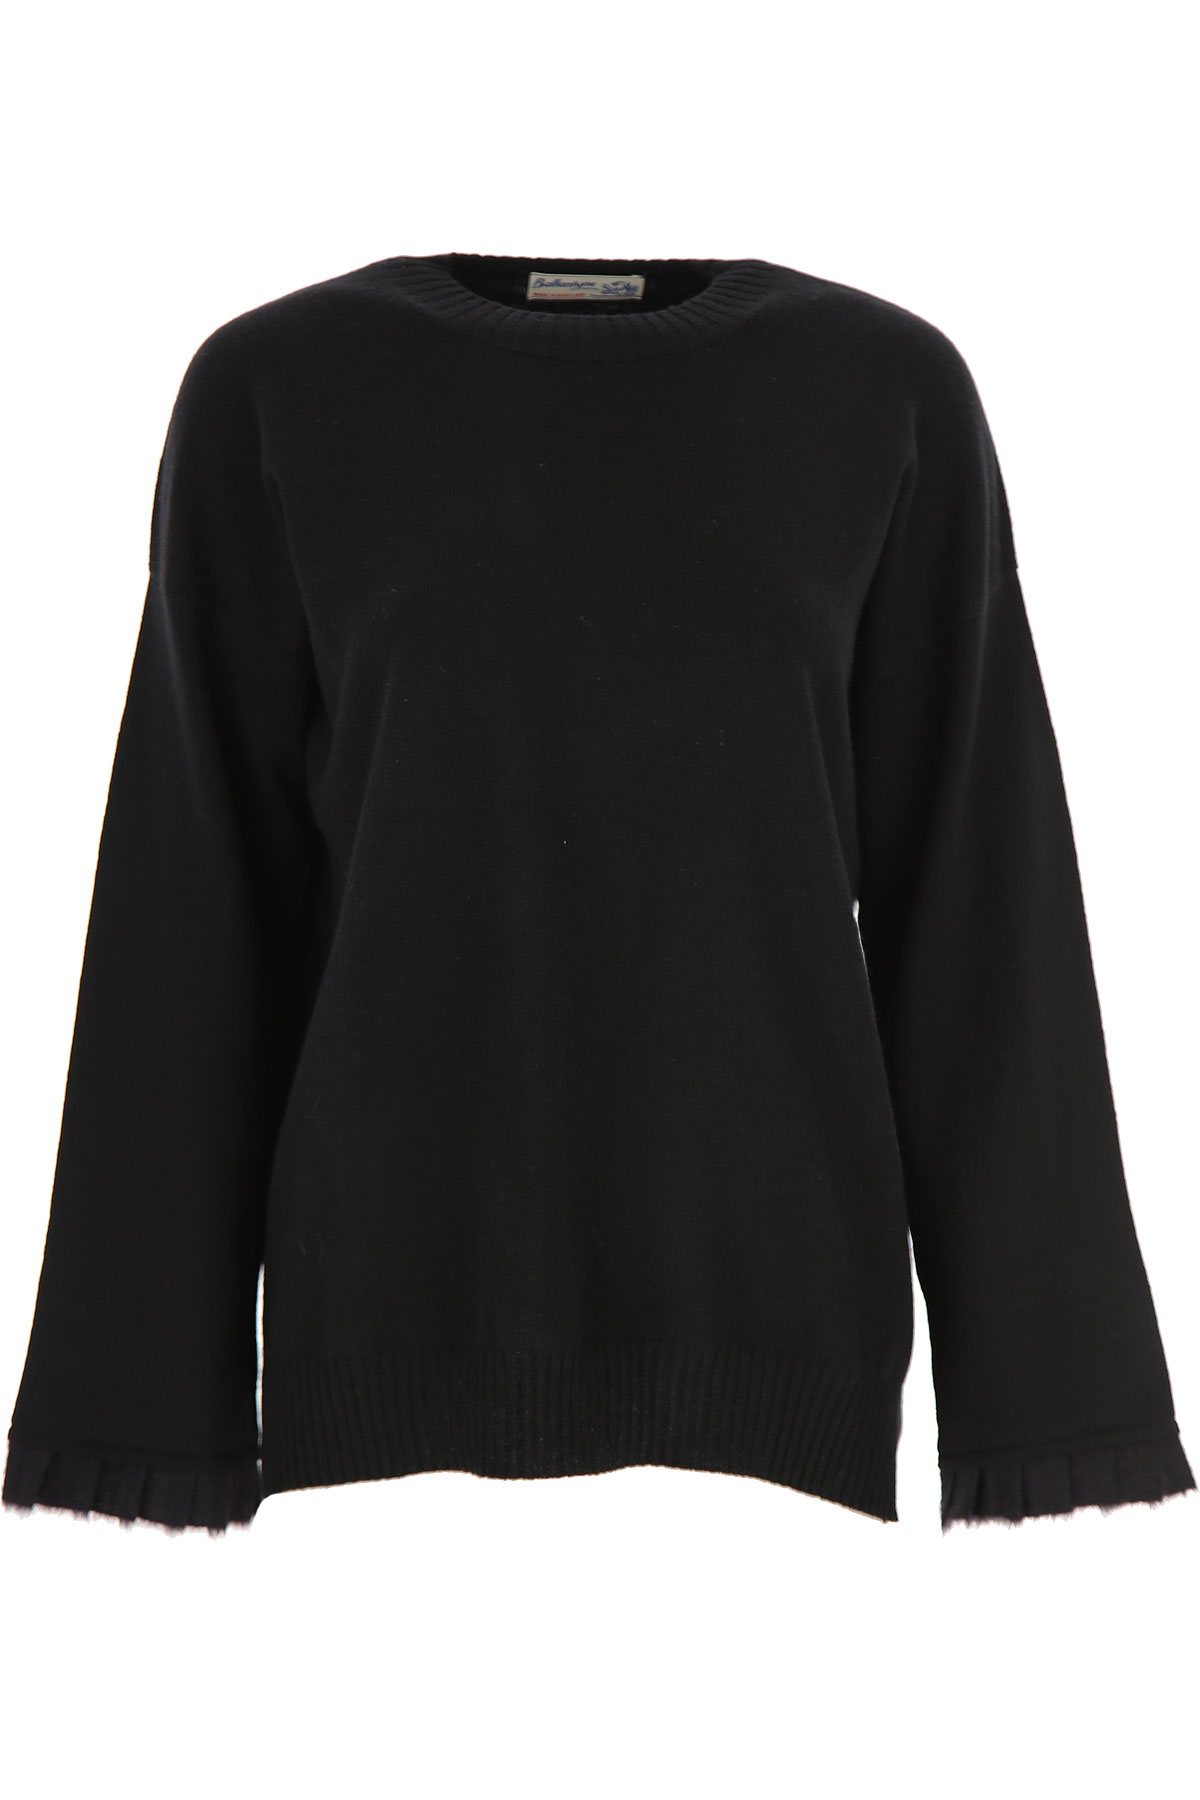 Ballantyne Sweater for Women Jumper On Sale, Black, Cashemere, 2019, 4 6